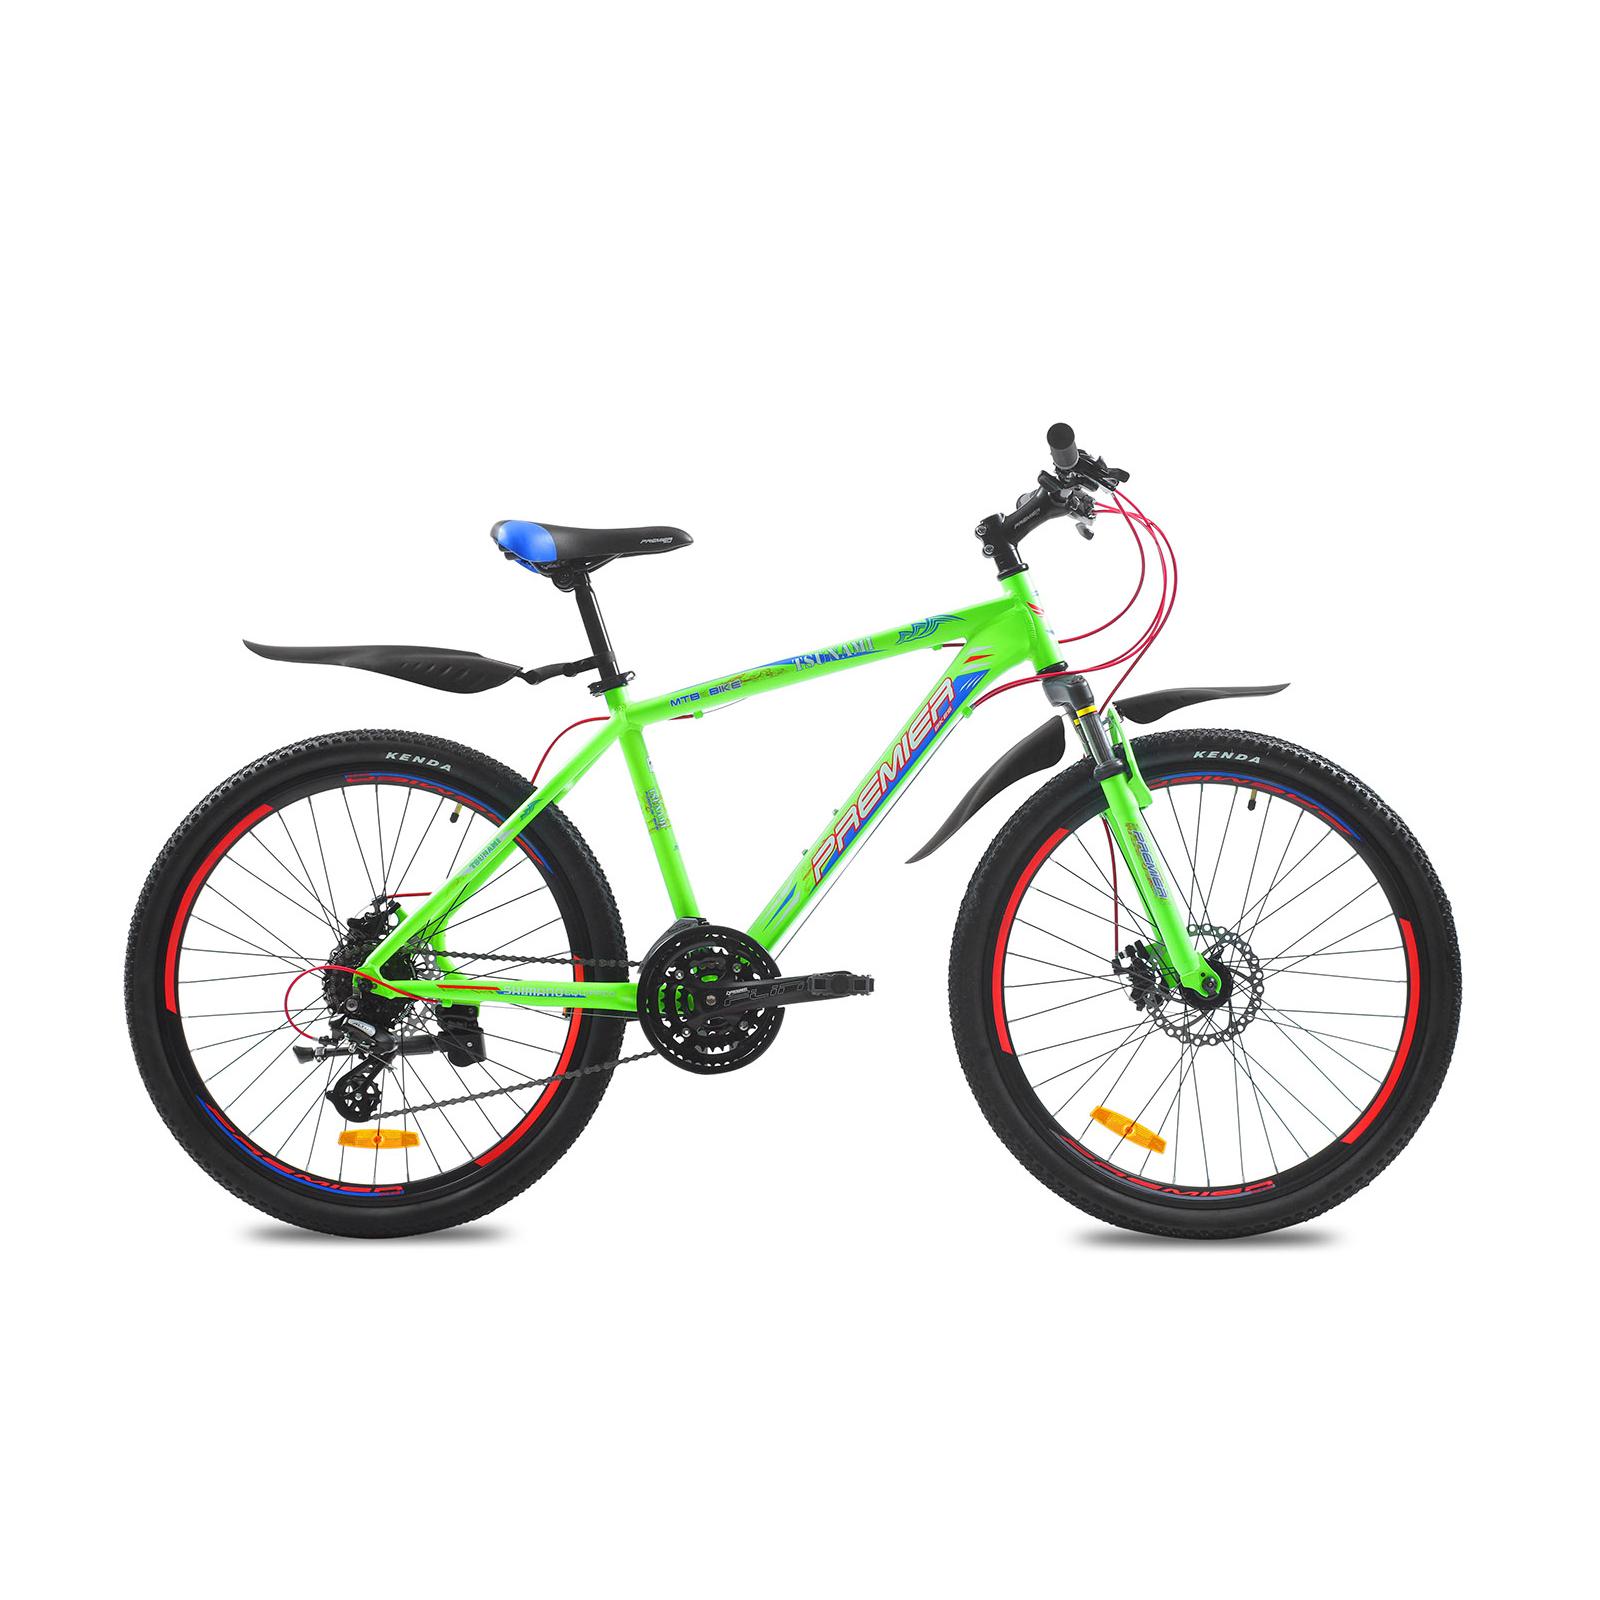 "Велосипед Premier Tsunami 26 Disc 17"" matt neon green (SP0001482)"